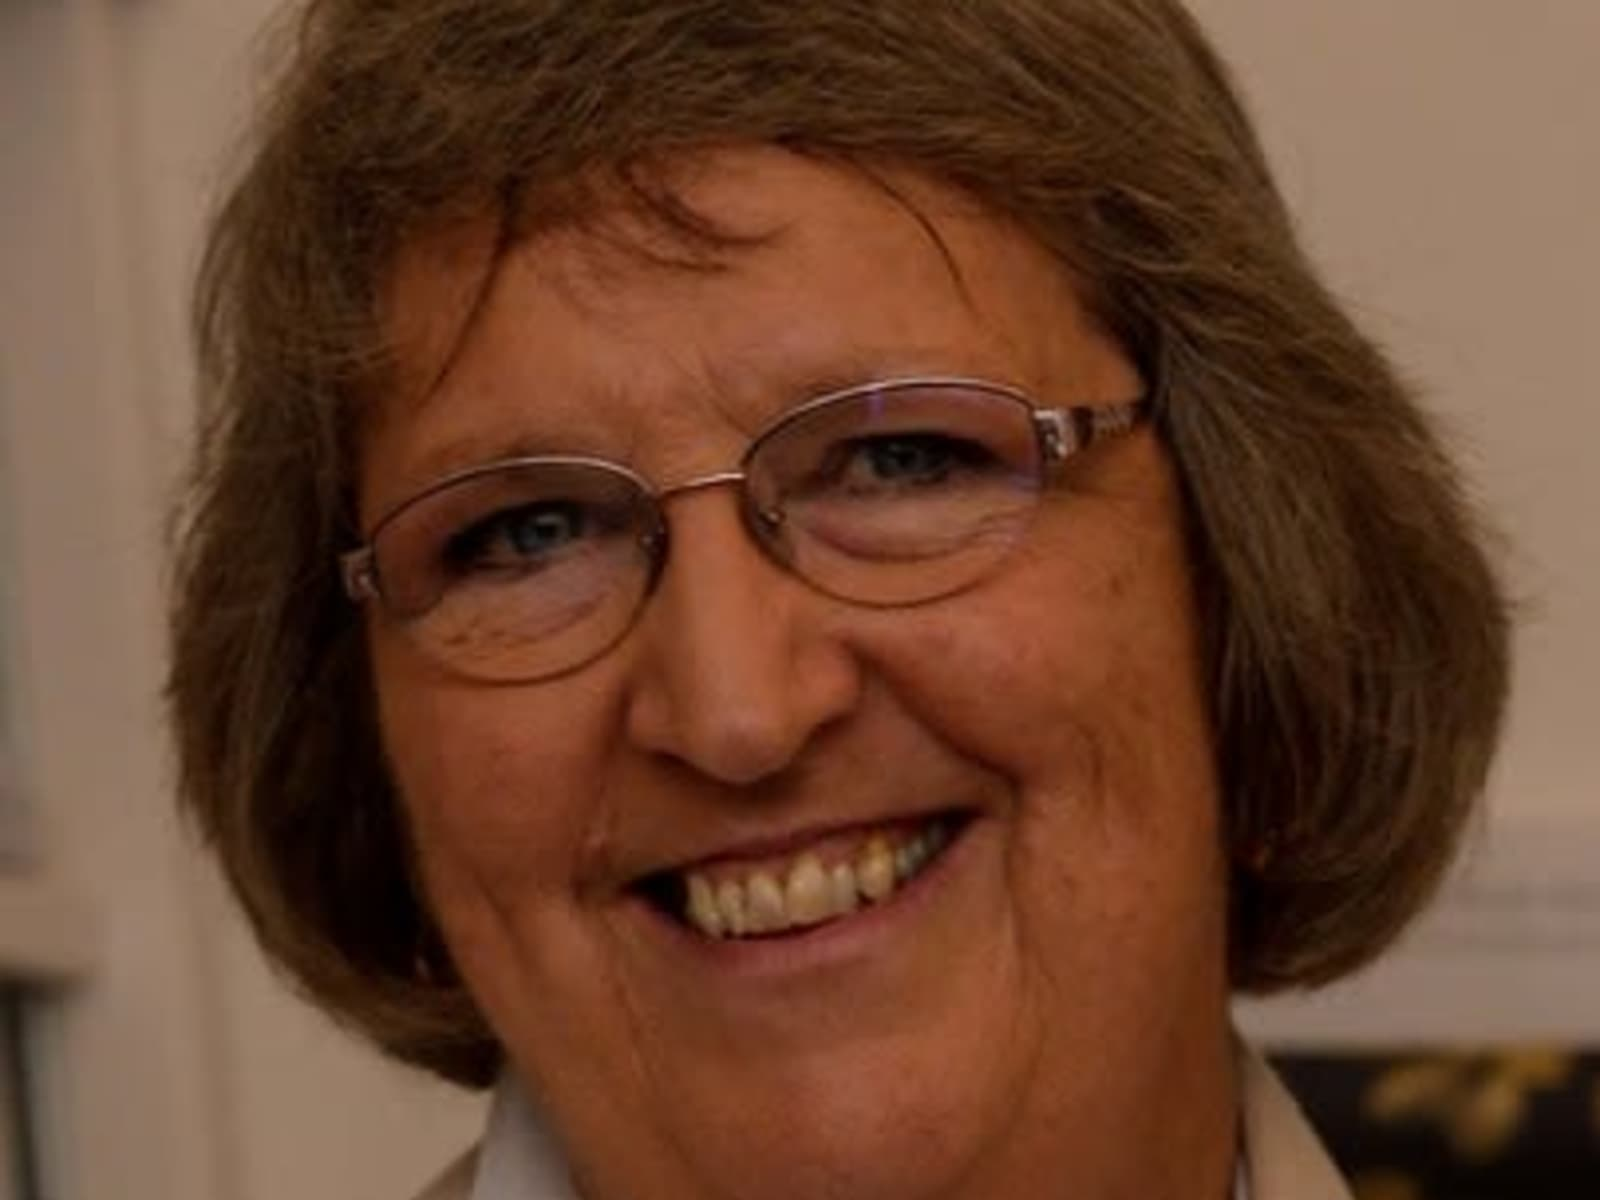 Deborah from Cheltenham, United Kingdom